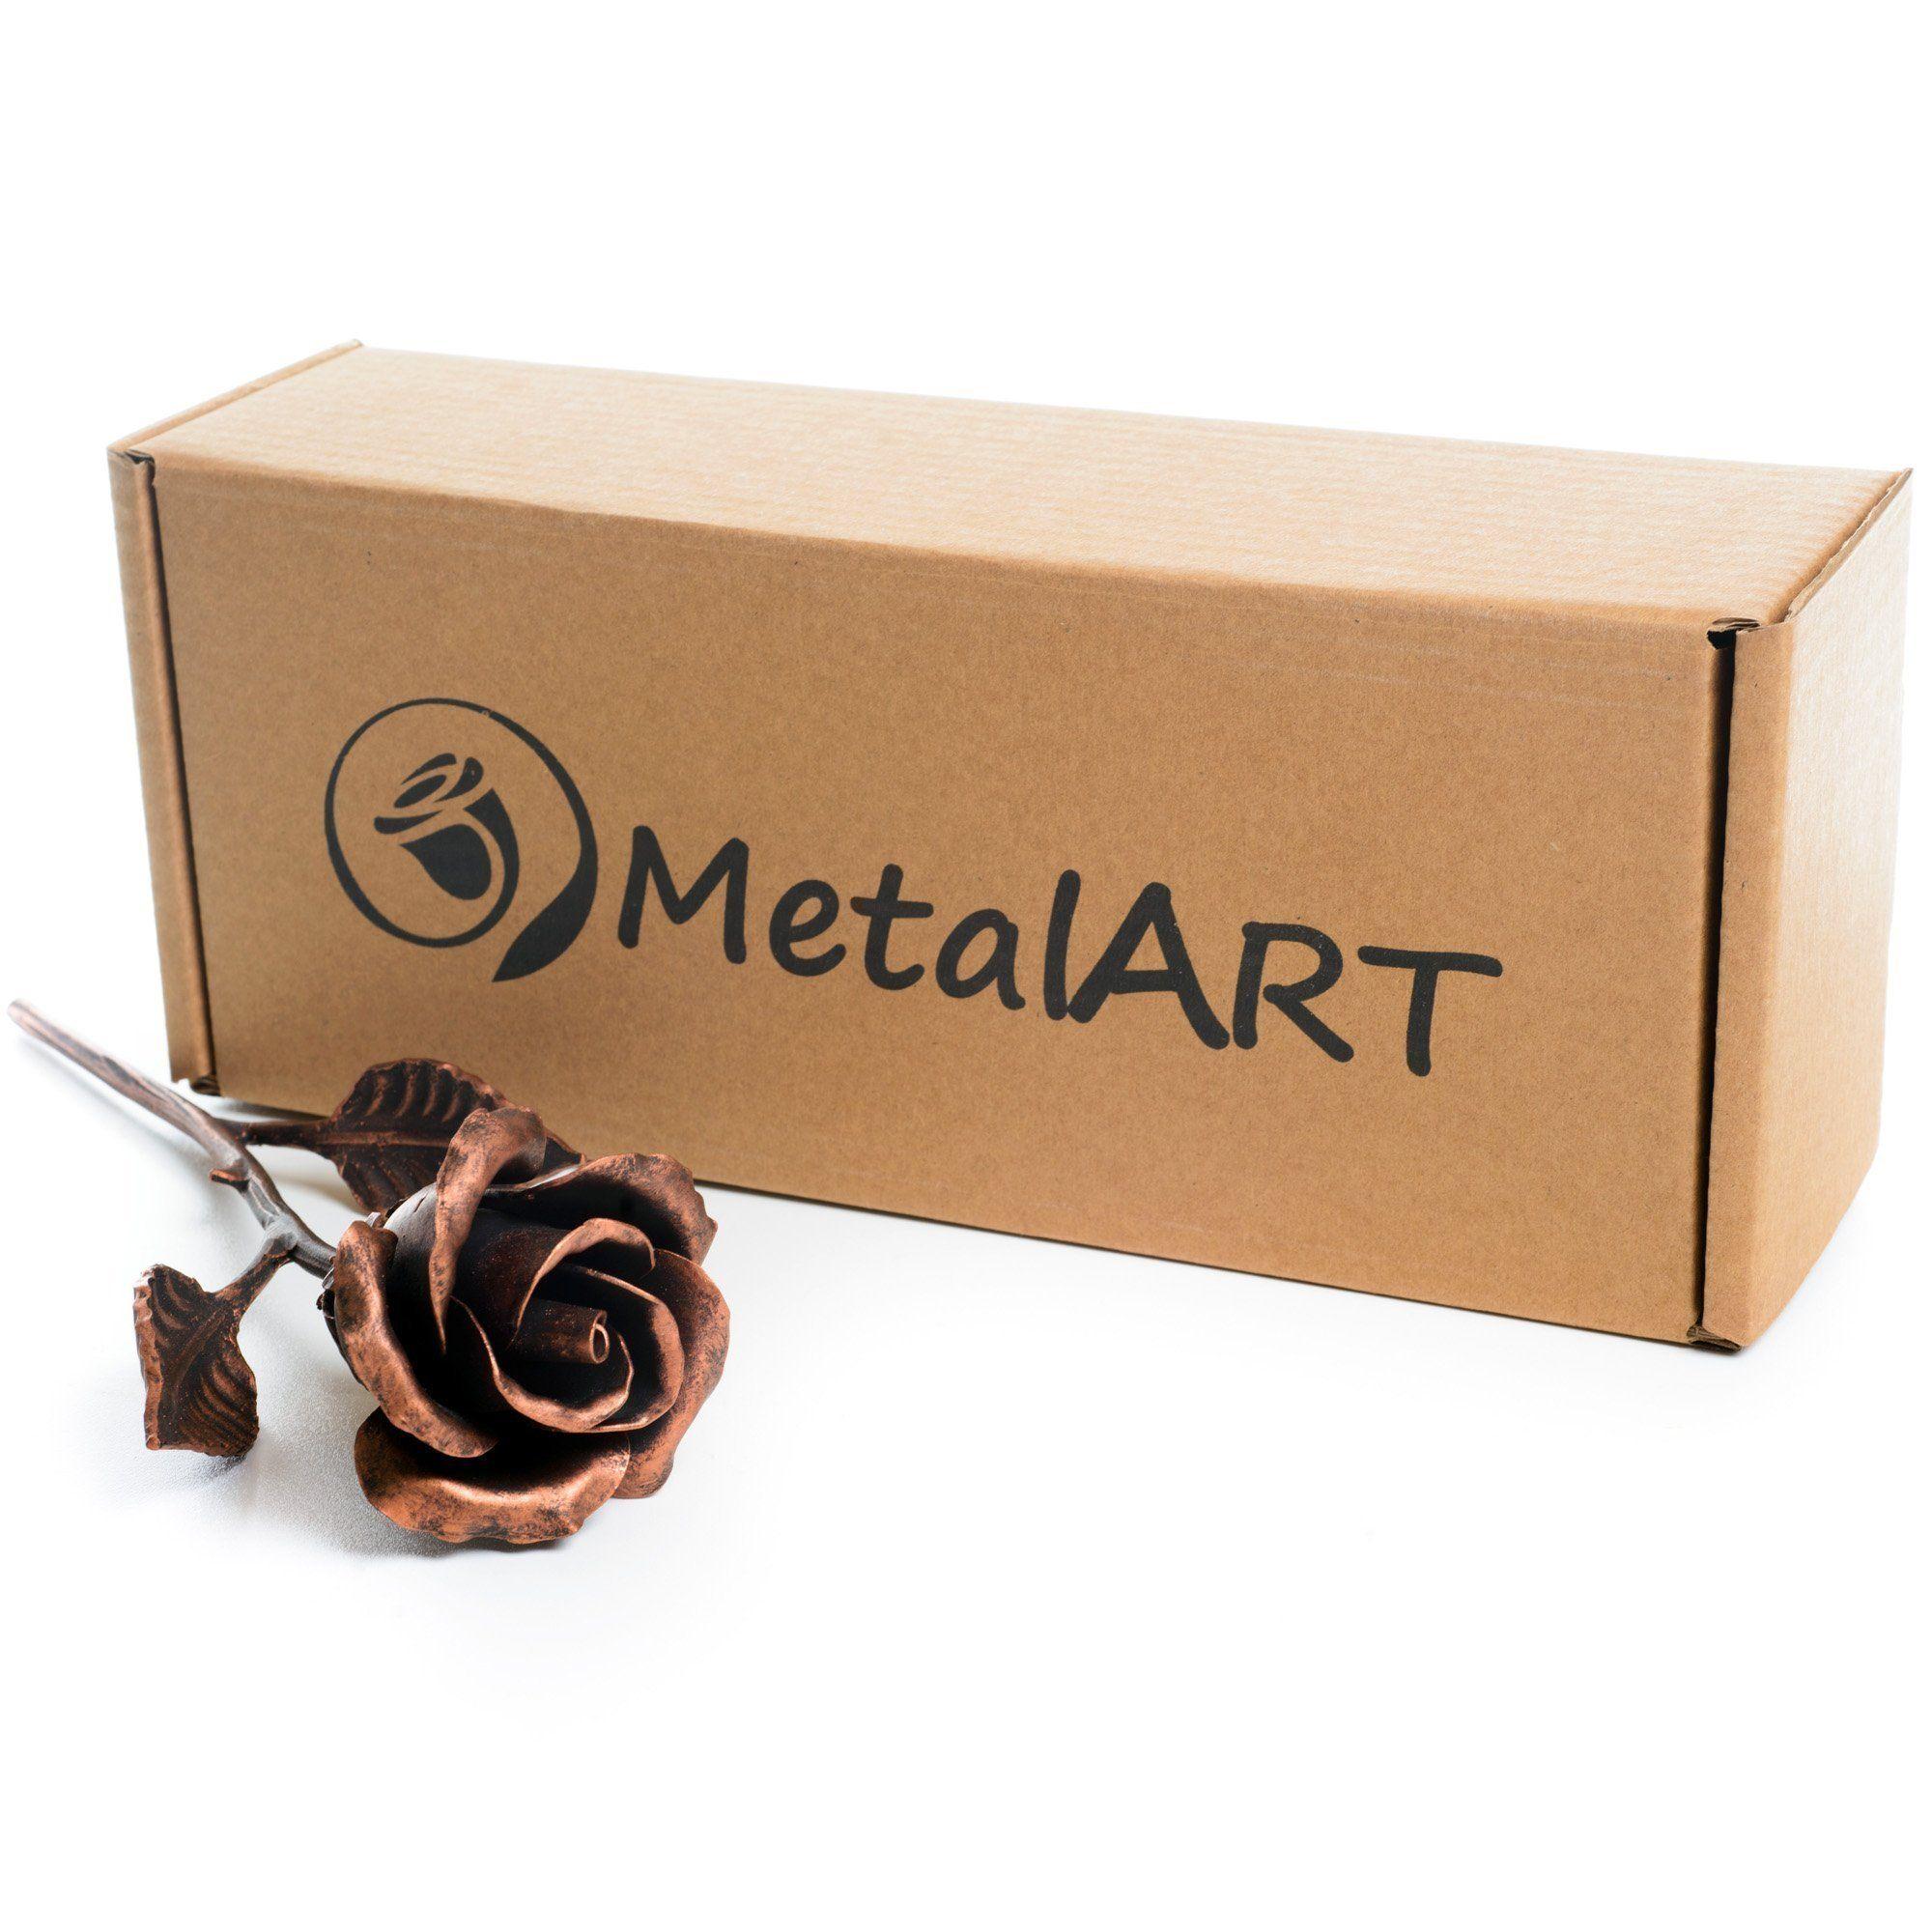 7th anniversary gift for her handmade copper rose